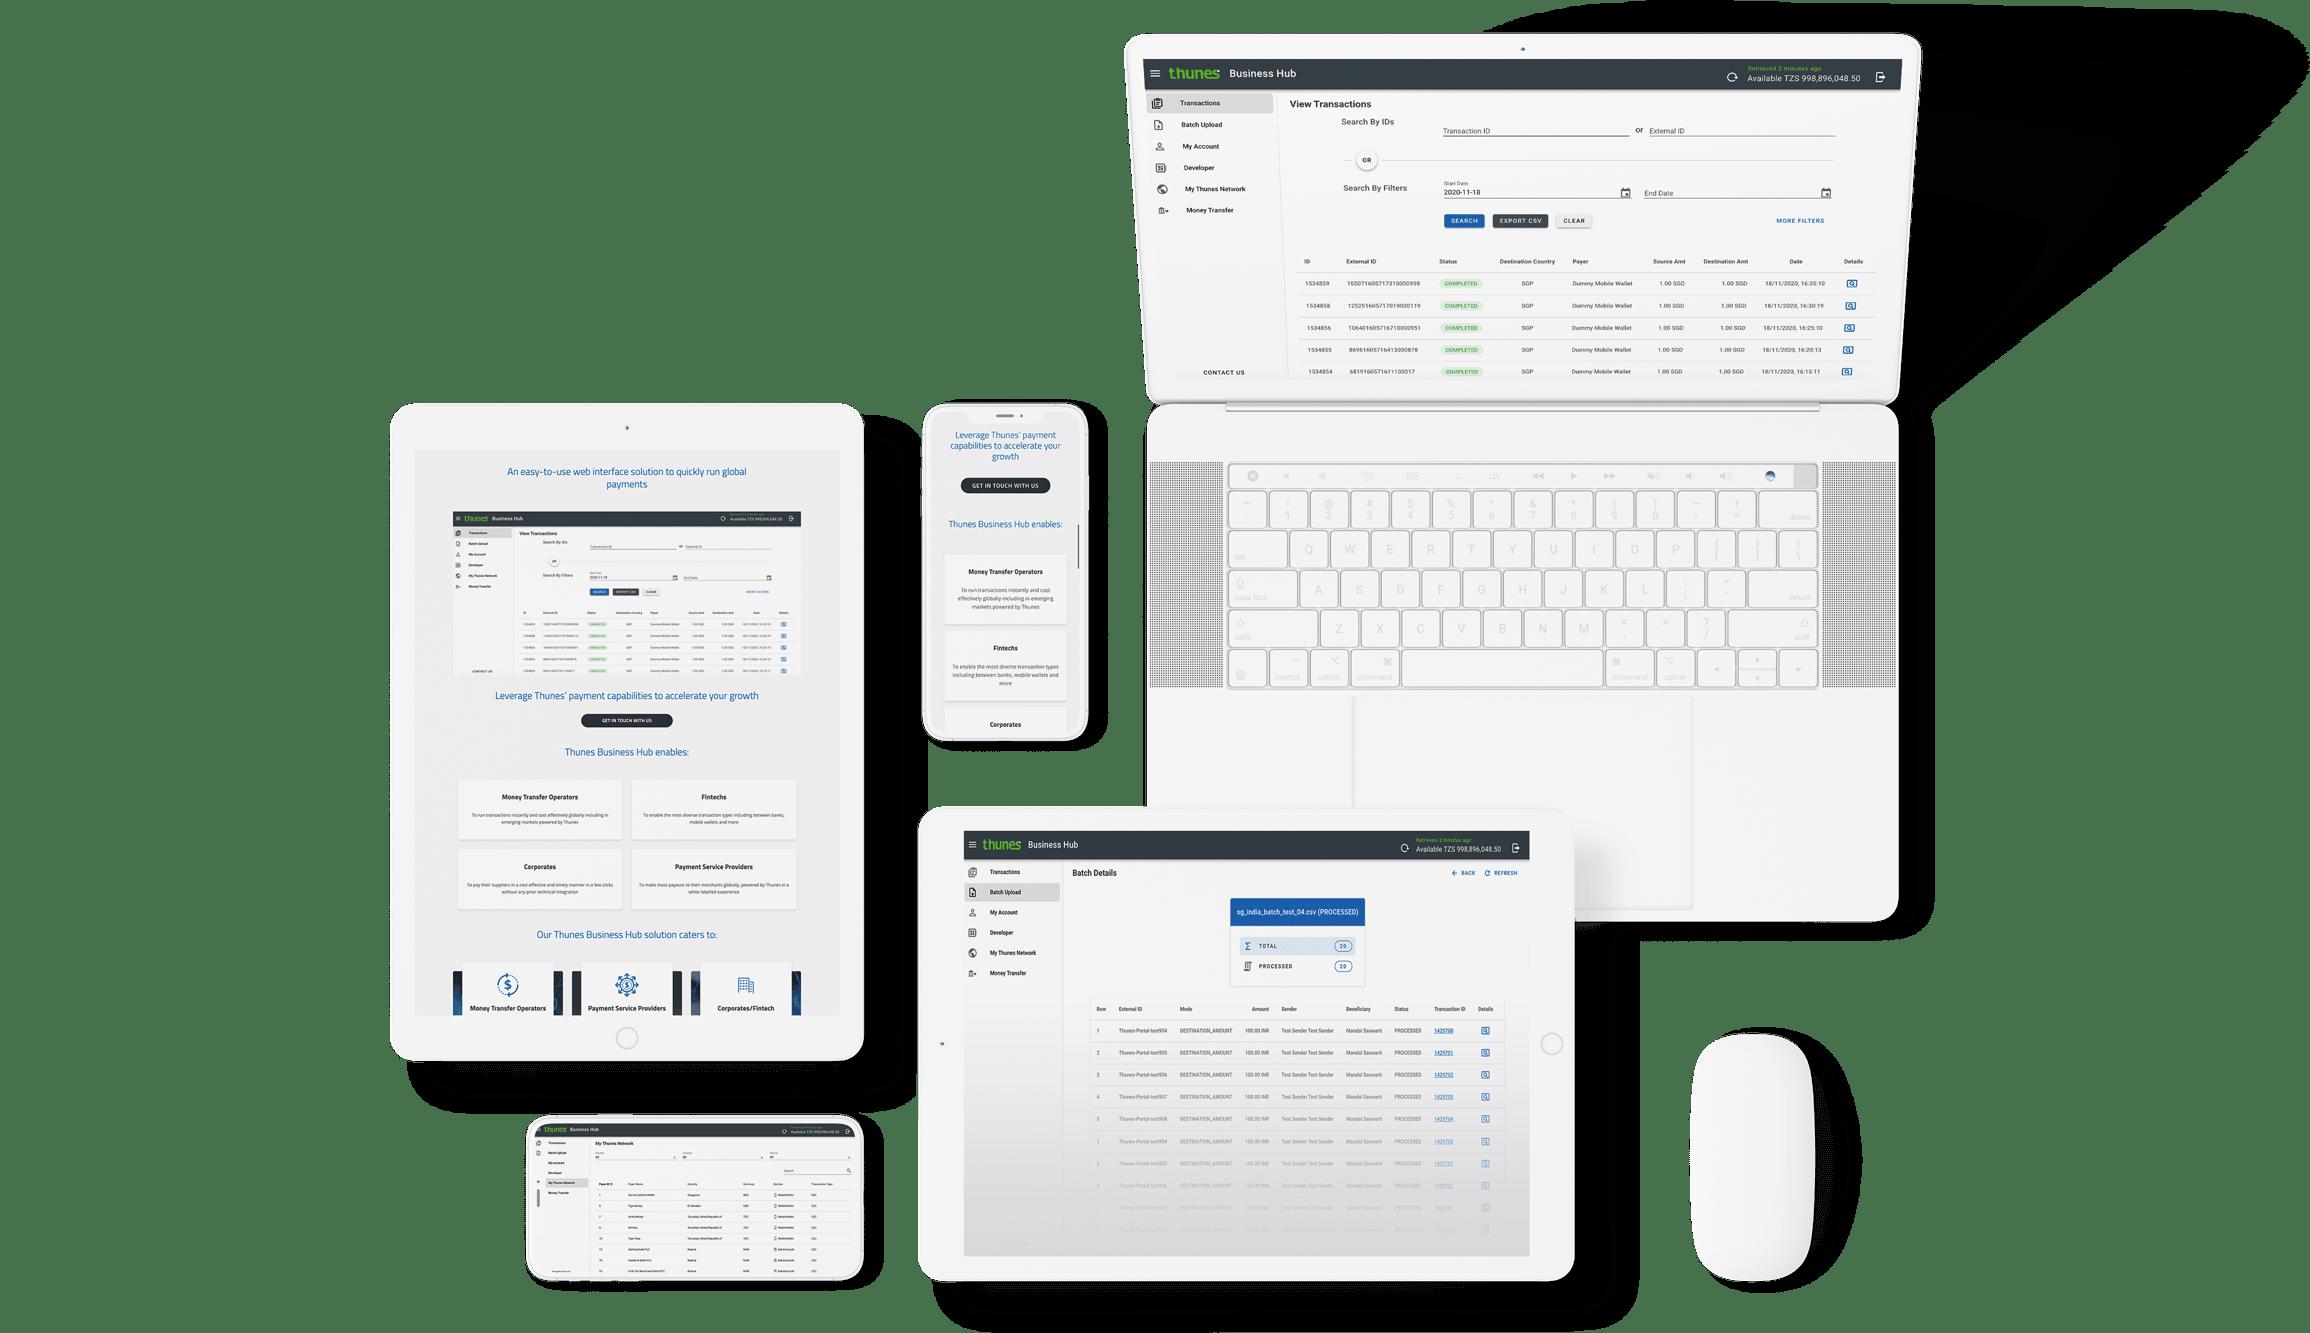 Thunes Business Hub Interface